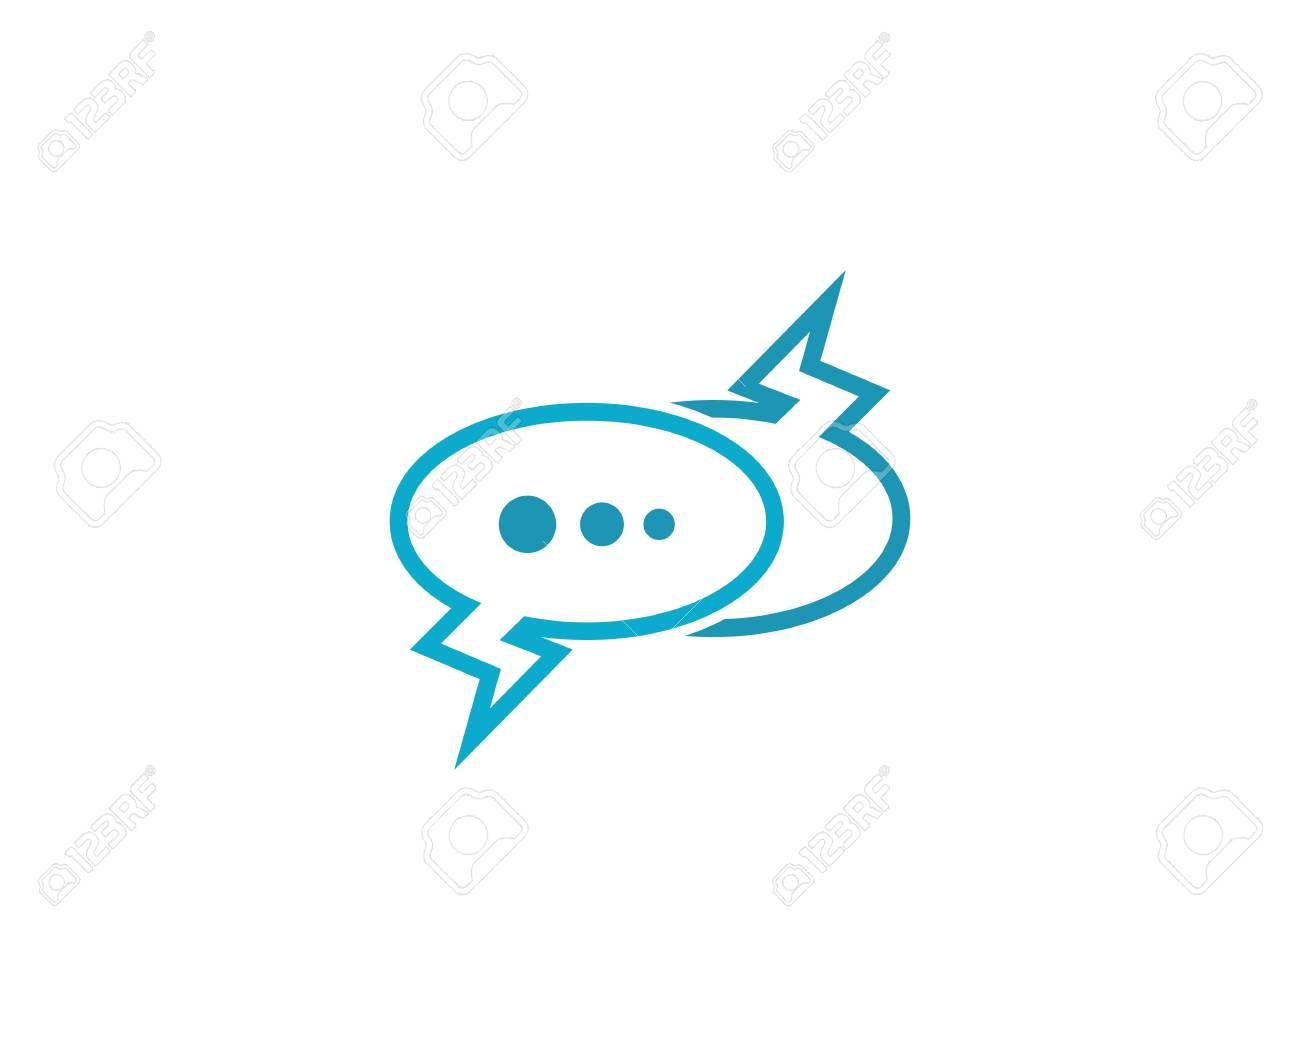 4882b6d394f1a5 Speech bubble icon Logo template vector illustration Stock Vector -  111606575